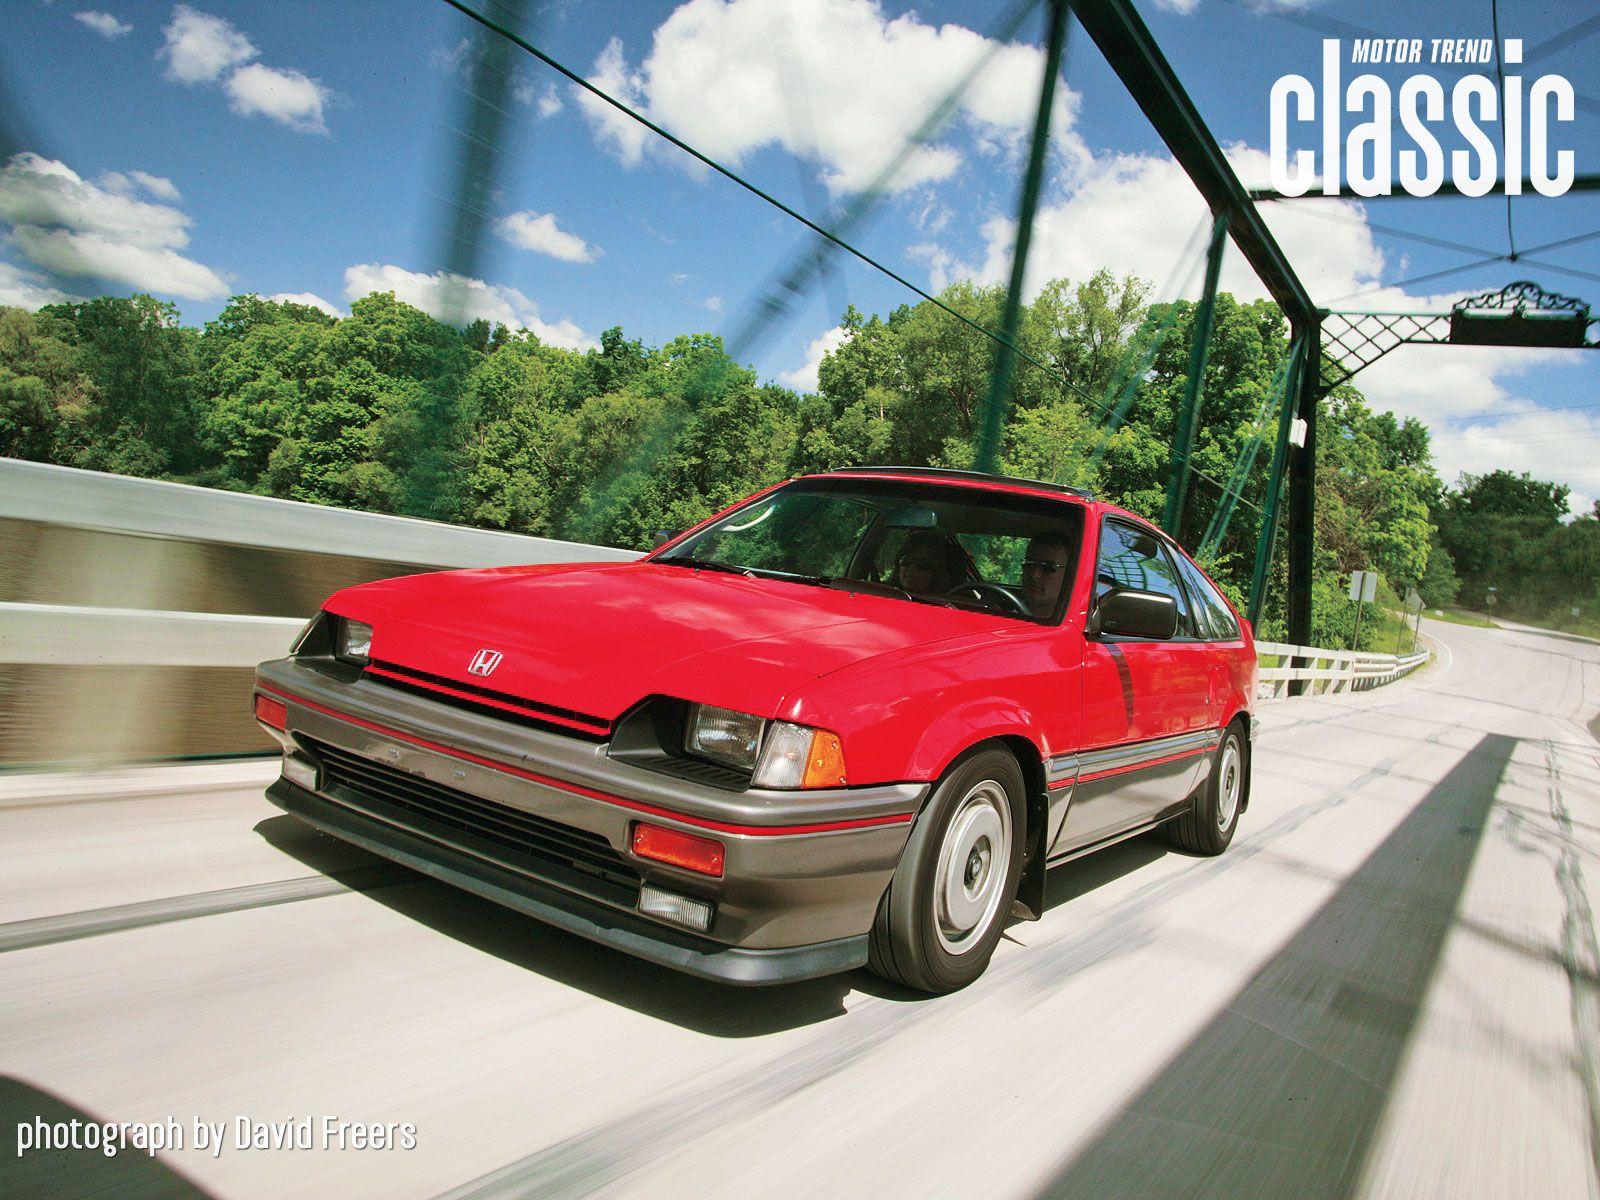 1985 Honda Crx Si Wallpaper Gallery Motor Trend Classic Honda Crx Honda Modified Cars